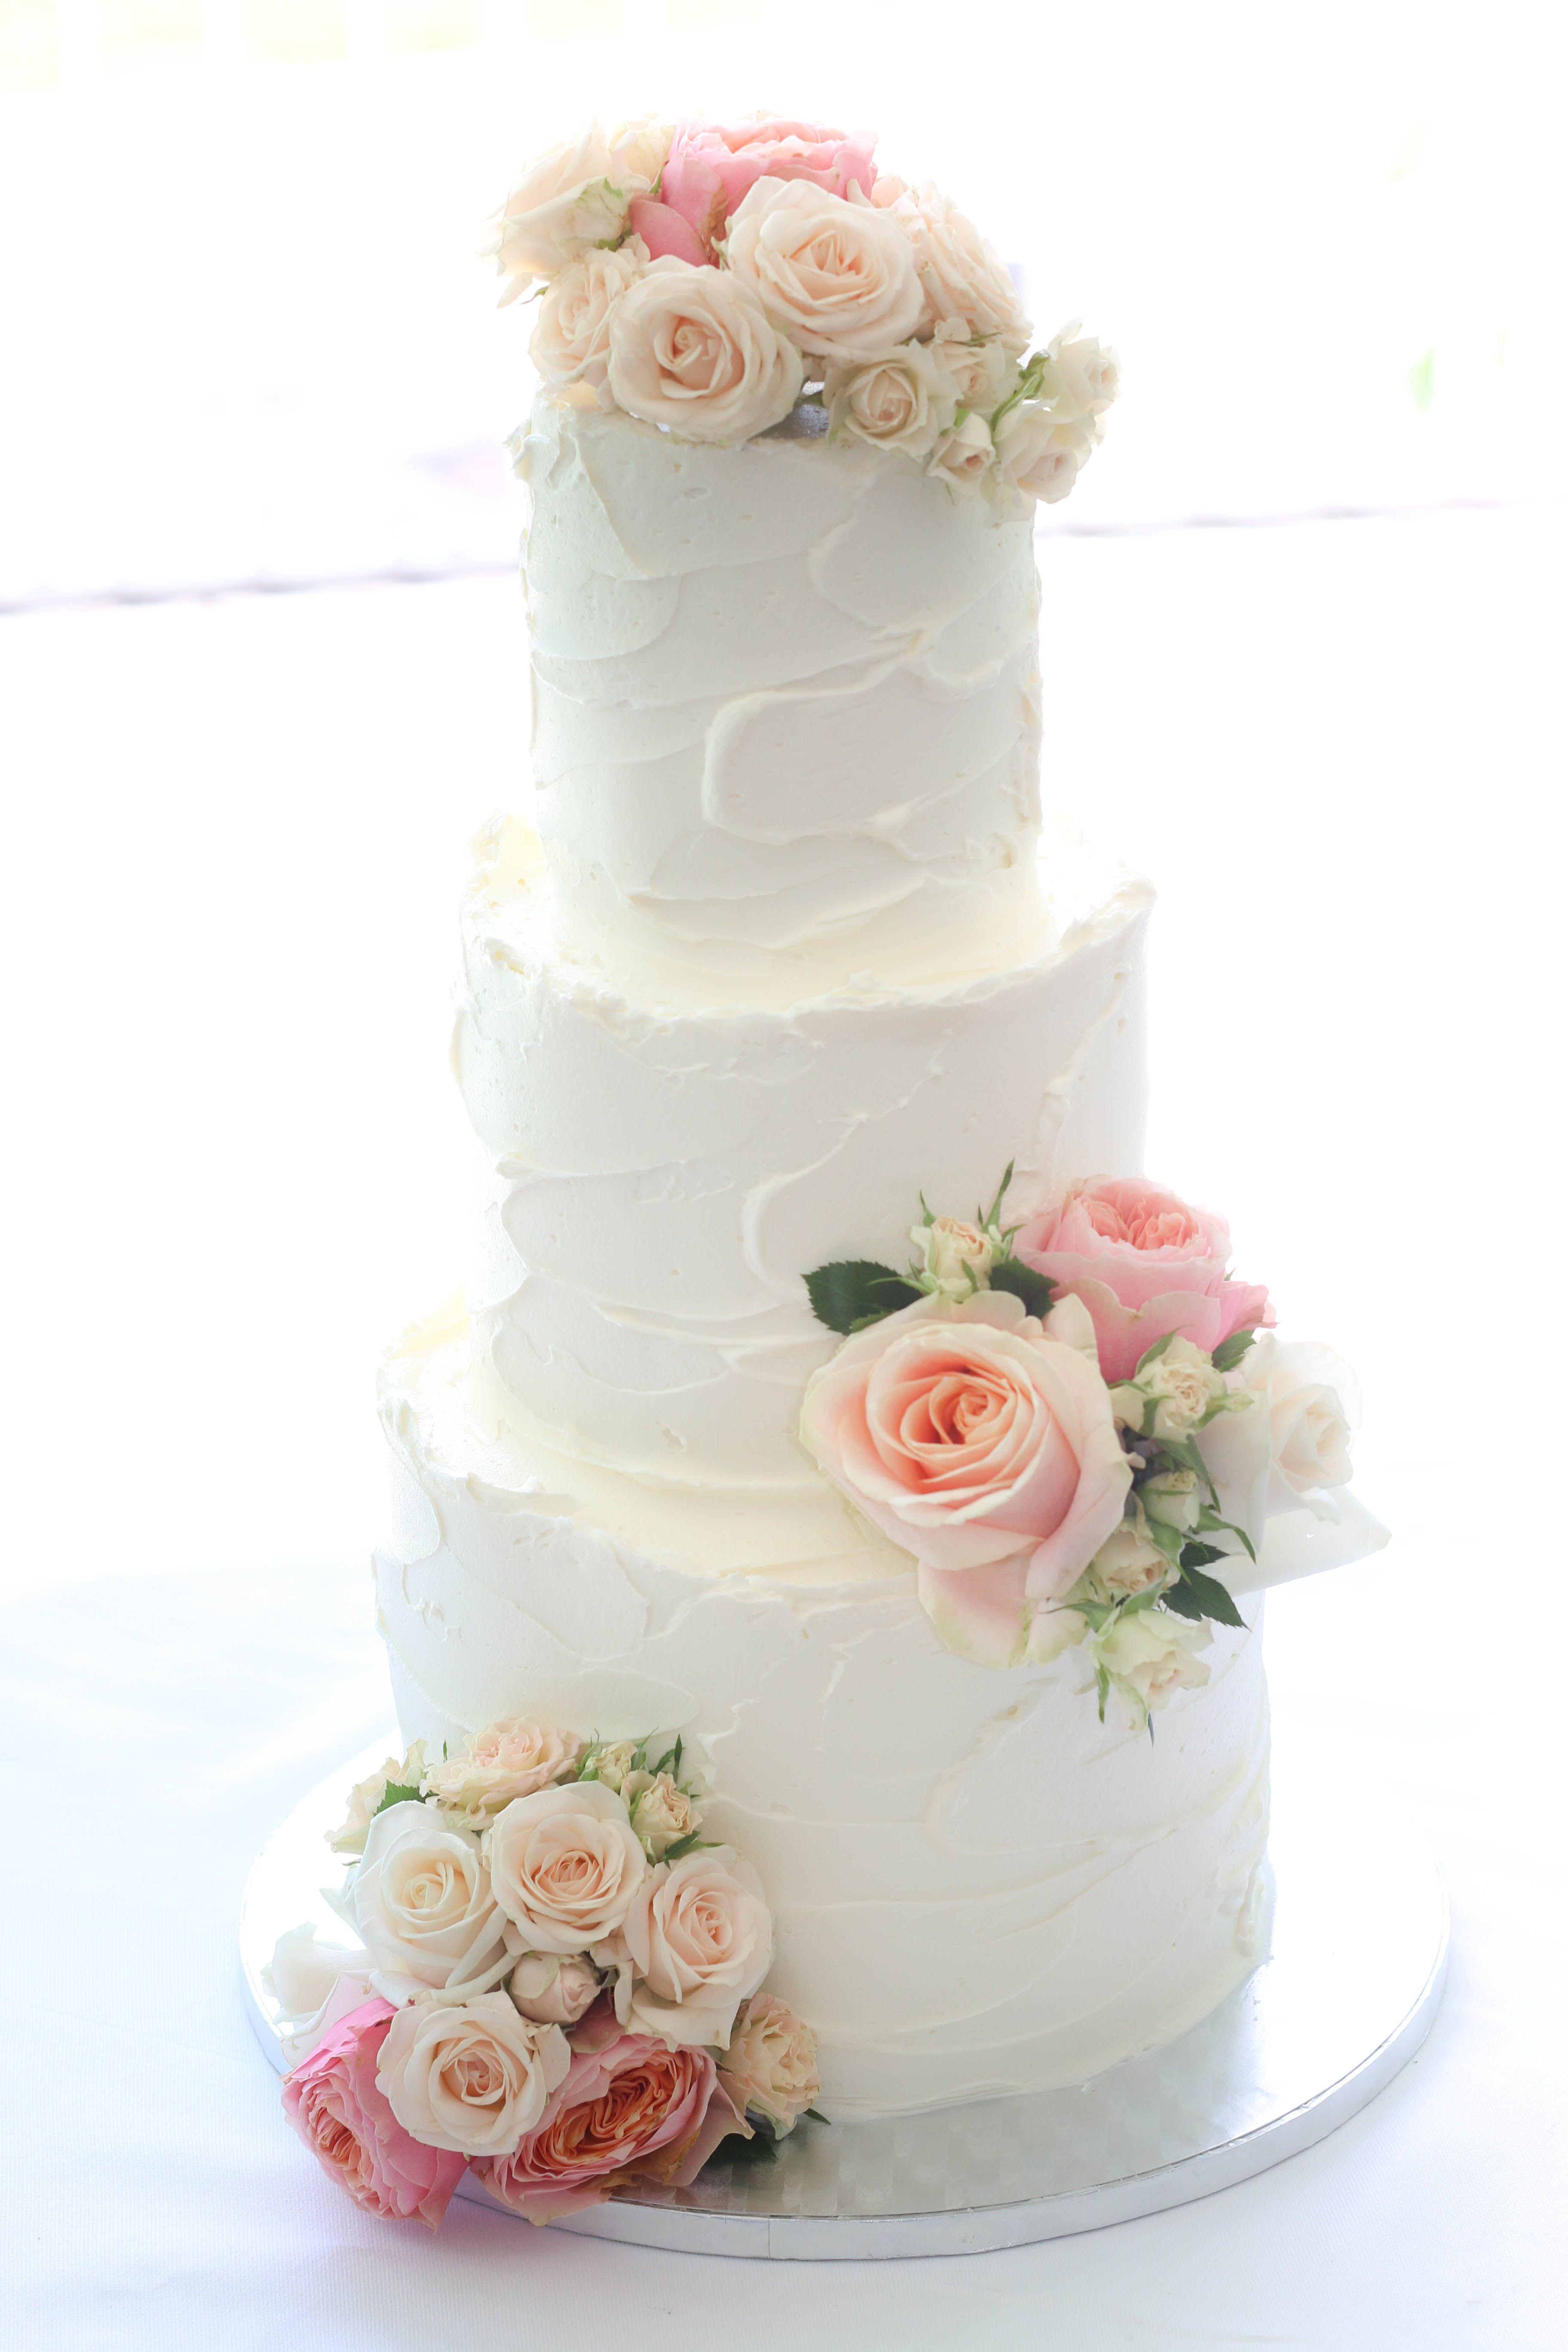 www.KUCHENmitSTIL.at - The finest pastry - 3 tier vintage wedding ...